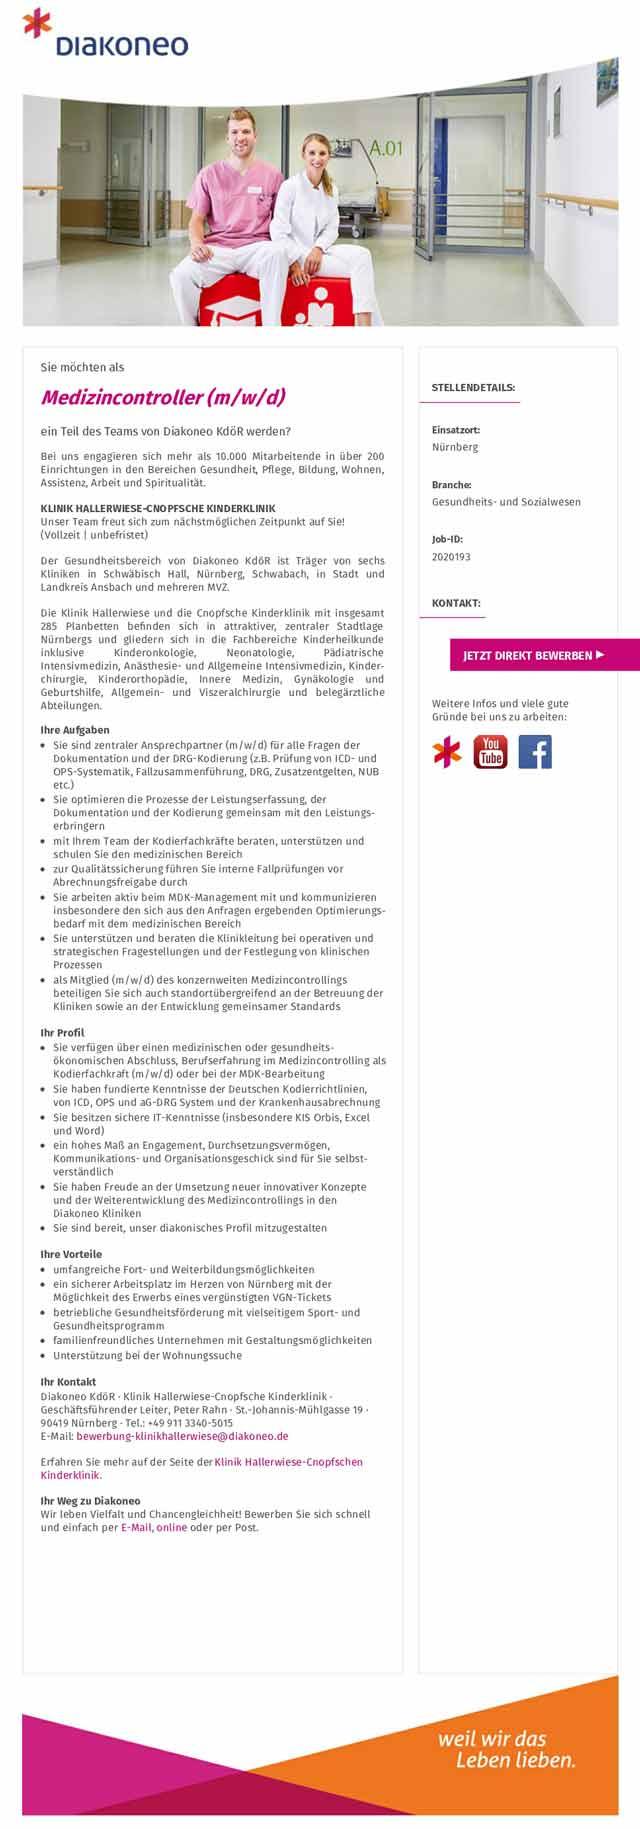 Diakoneo KdöR - Klinik Hallerwiese-Cnopfsche Kinderklinik: Medizincontroller (m/w/d)